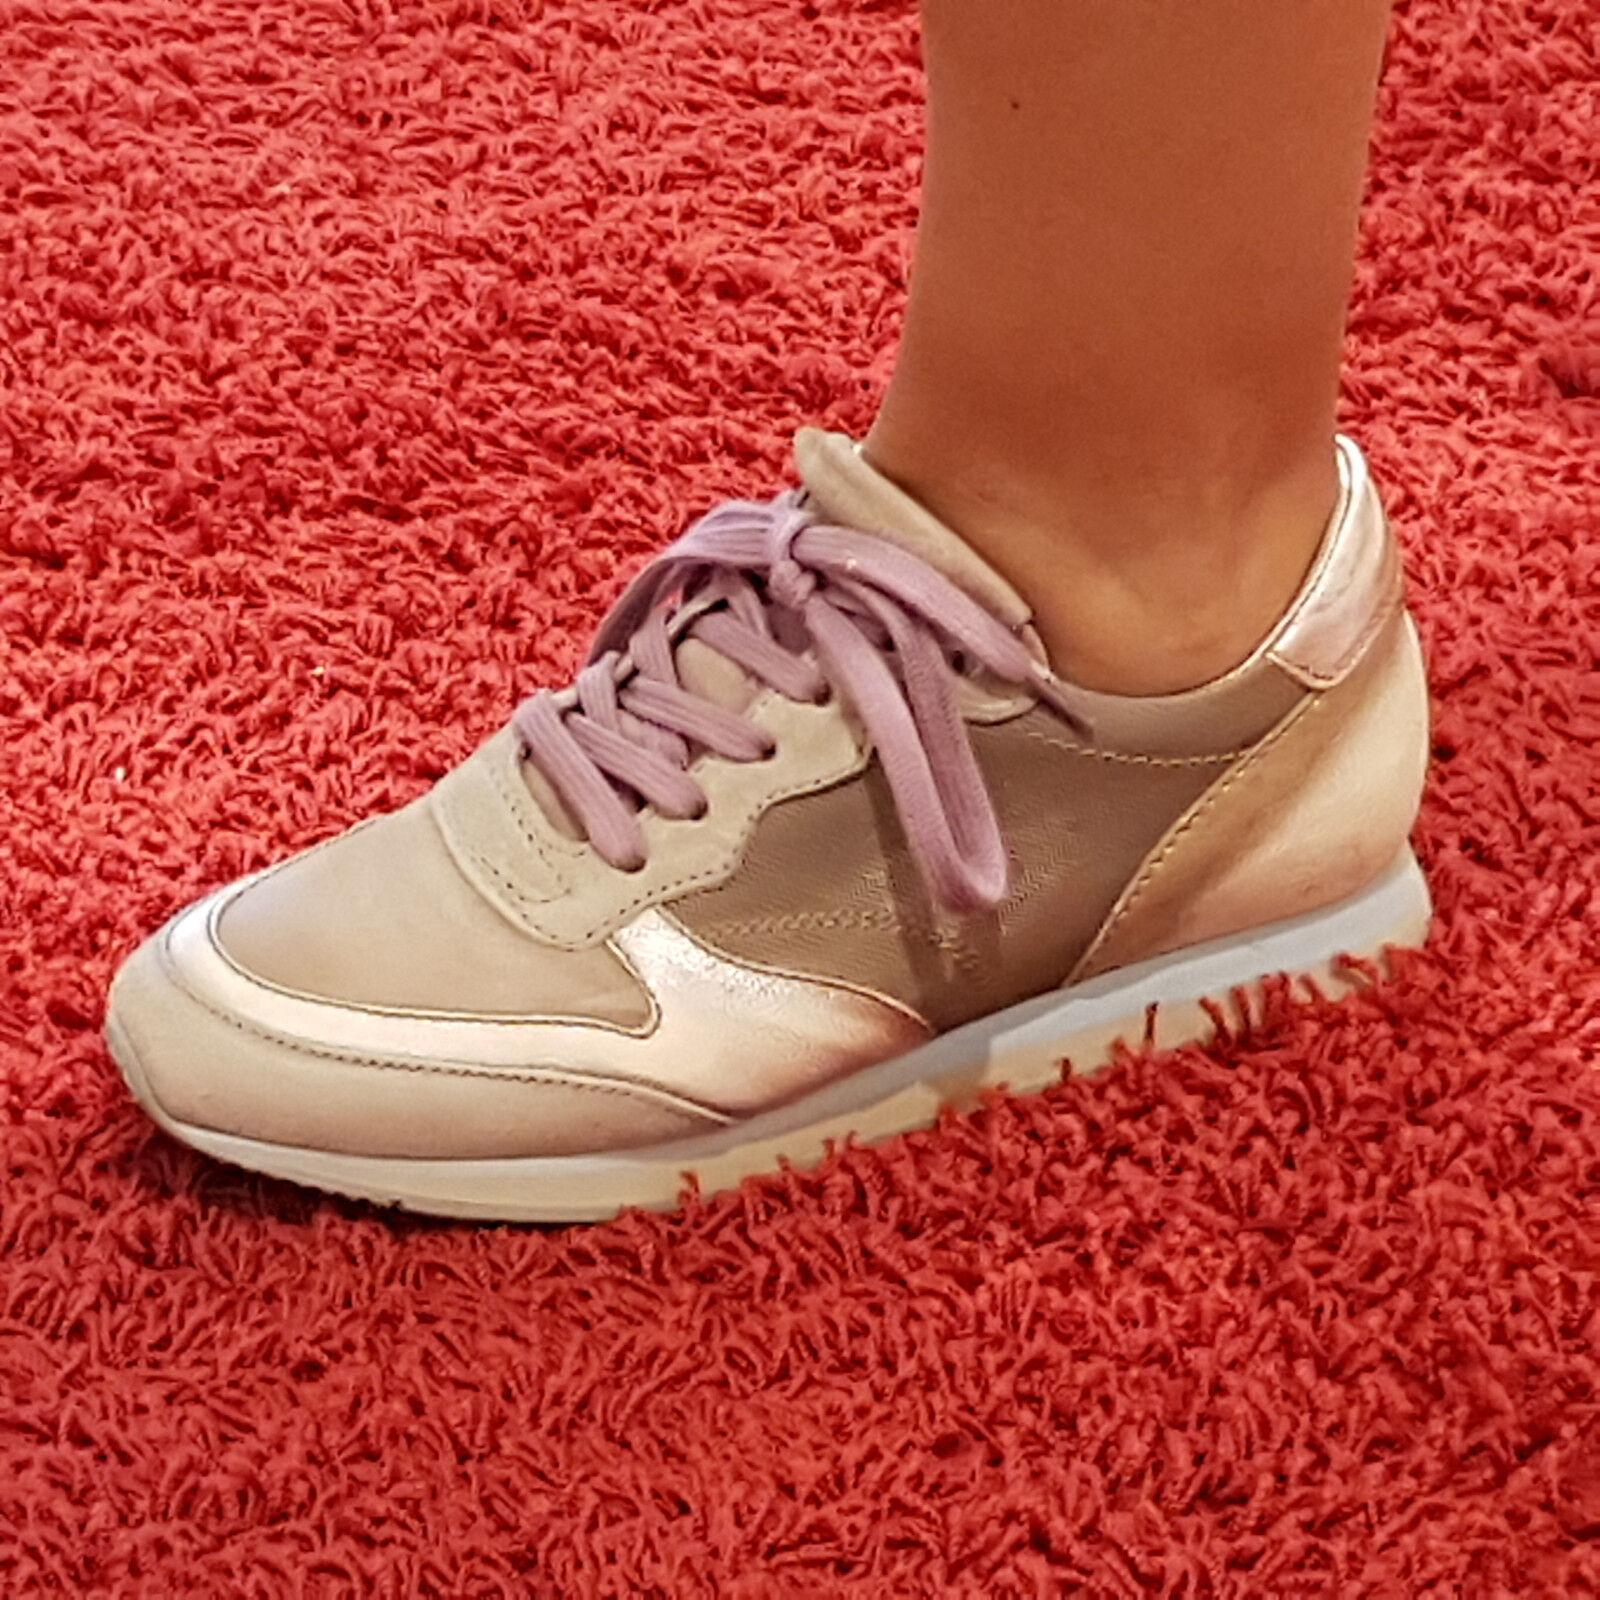 Grandes zapatos con descuento 030 Berlin by Mjus Damen Sneaker Schnürschuhe Schuhe rose Leder NEU Gr.37